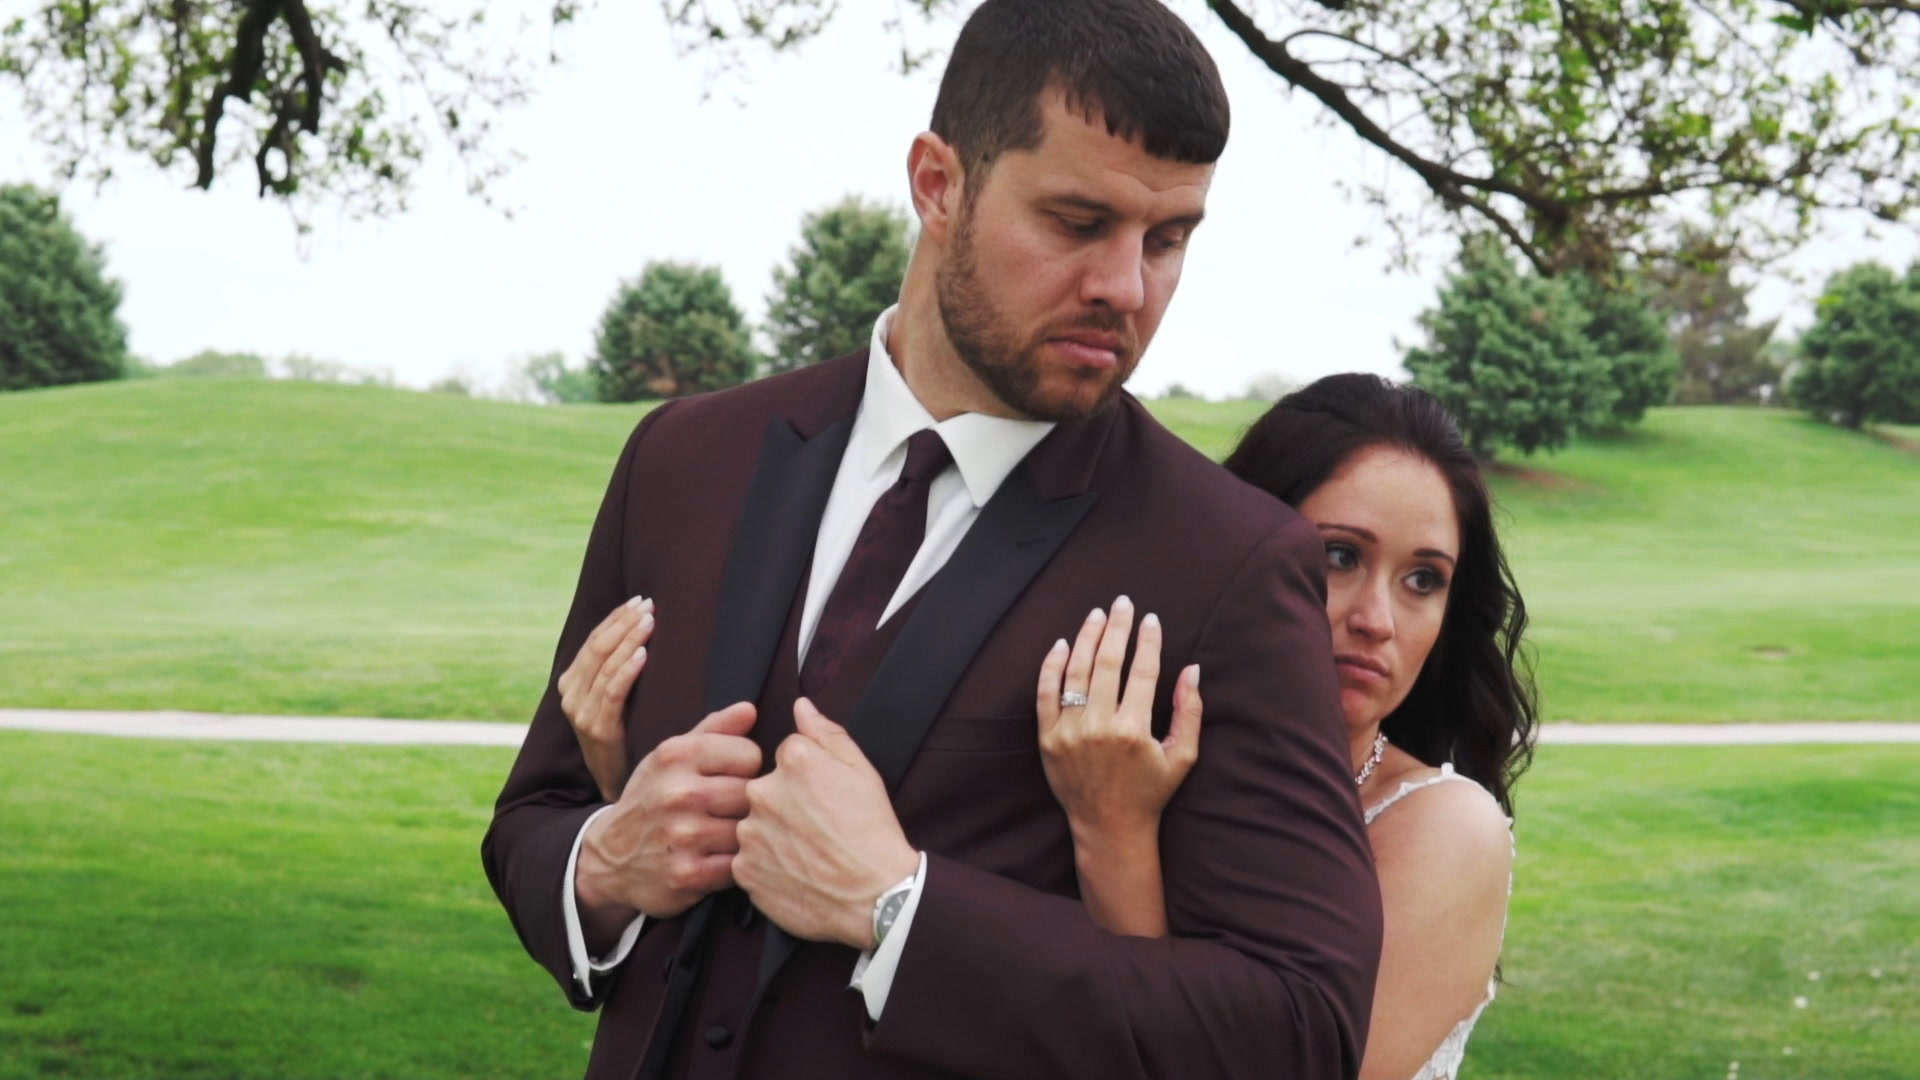 Cassandra + Jake | Lincoln, Nebraska | Courtside Banquet Hall